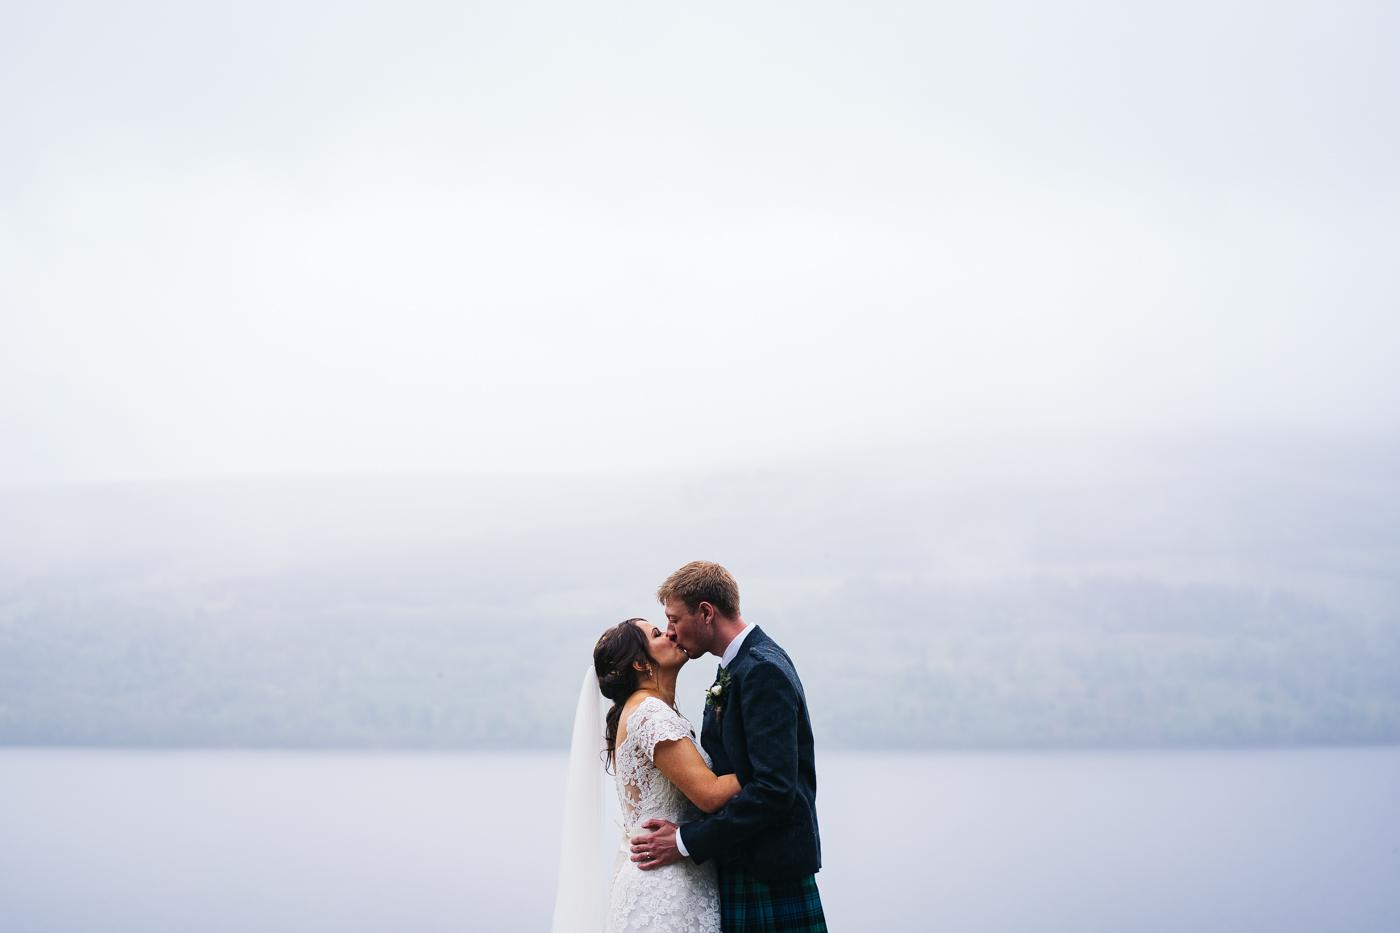 scottish-wedding-trossachs-loch-tay-highlannds-relaxed-photography-photographer-0027.jpg